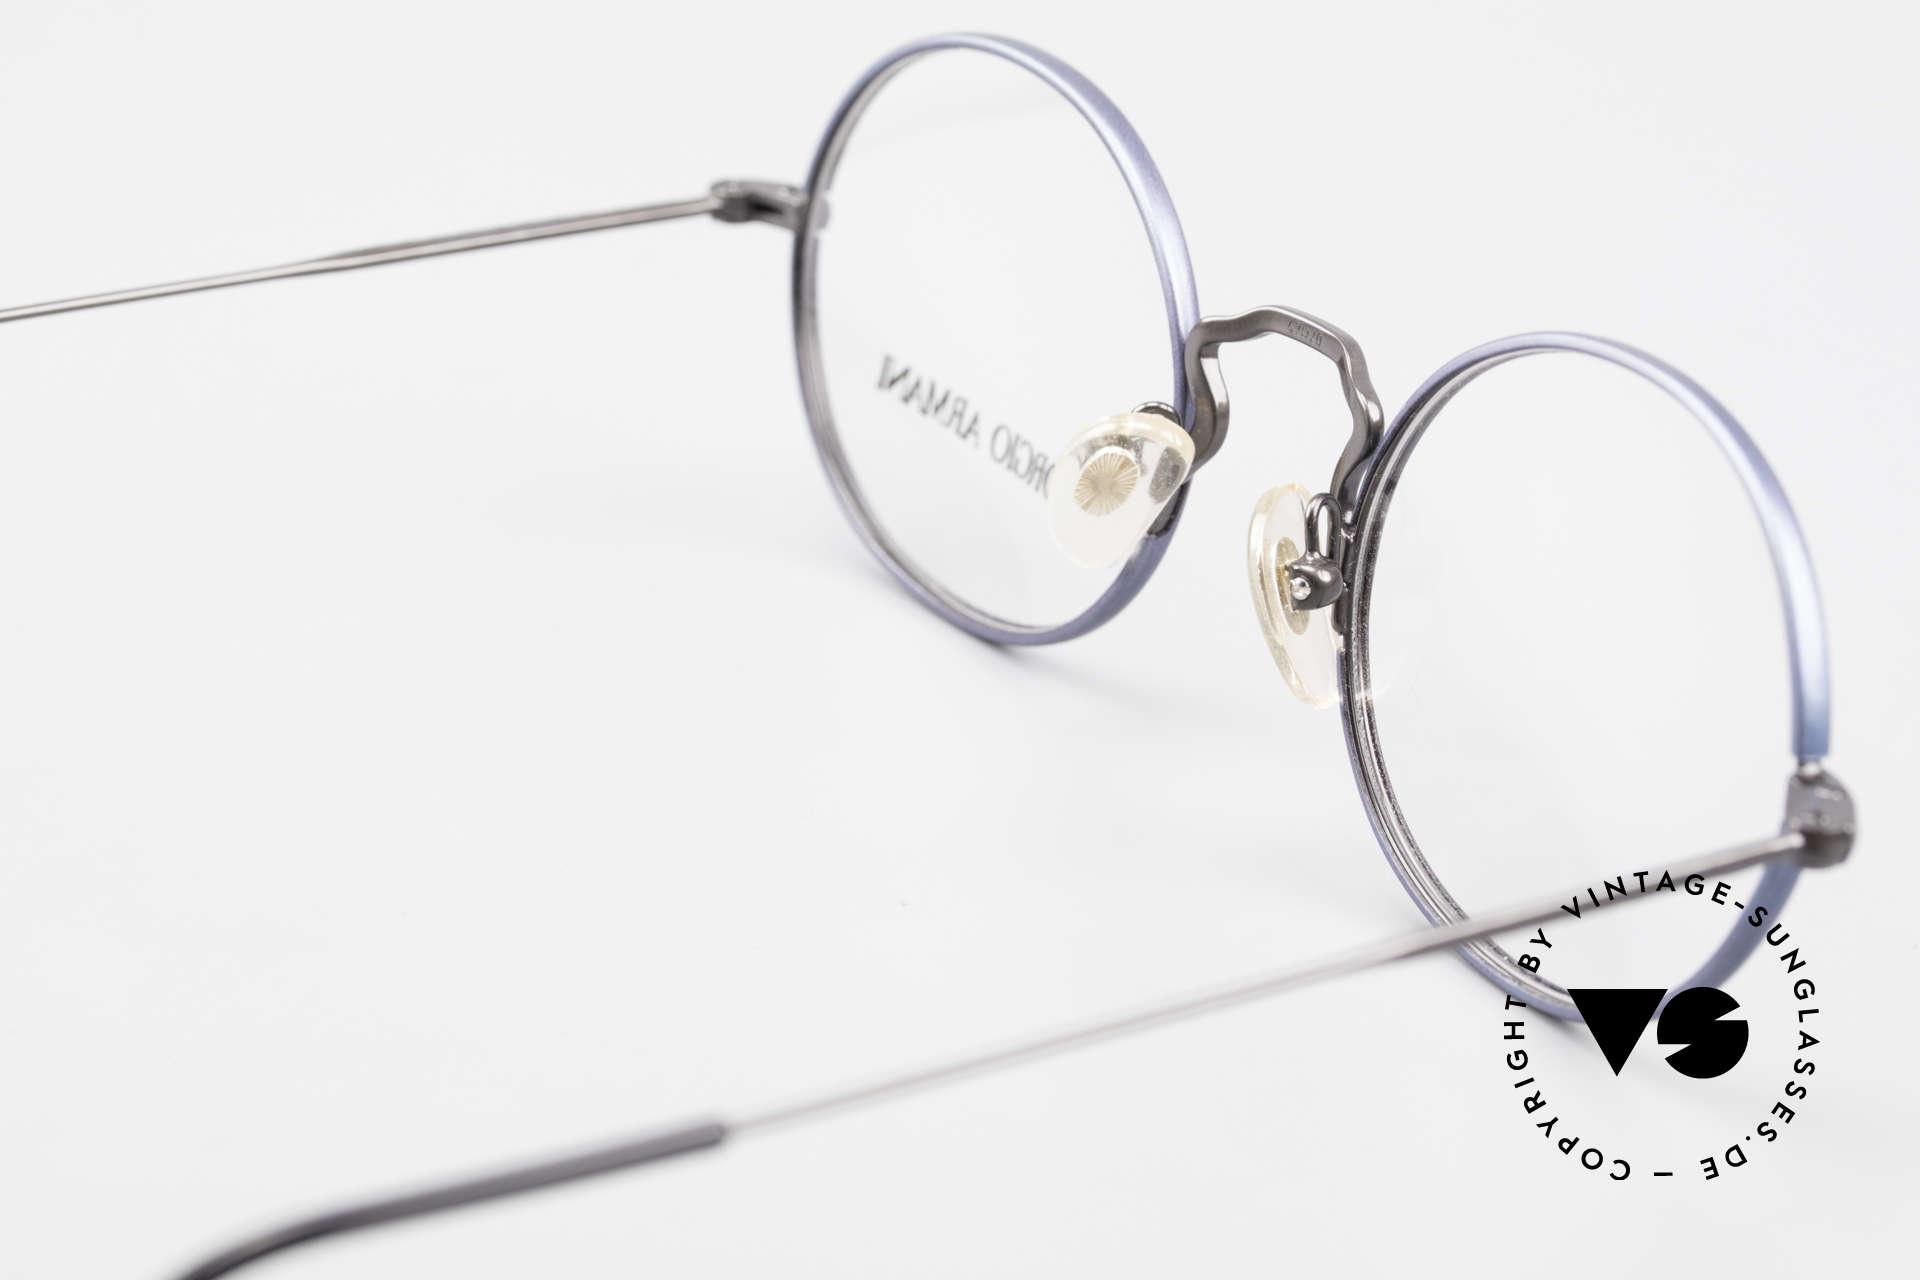 Giorgio Armani 247 No Retro Eyeglasses 90's Oval, frame can be glazed with optical lenses / sun lenses, Made for Men and Women